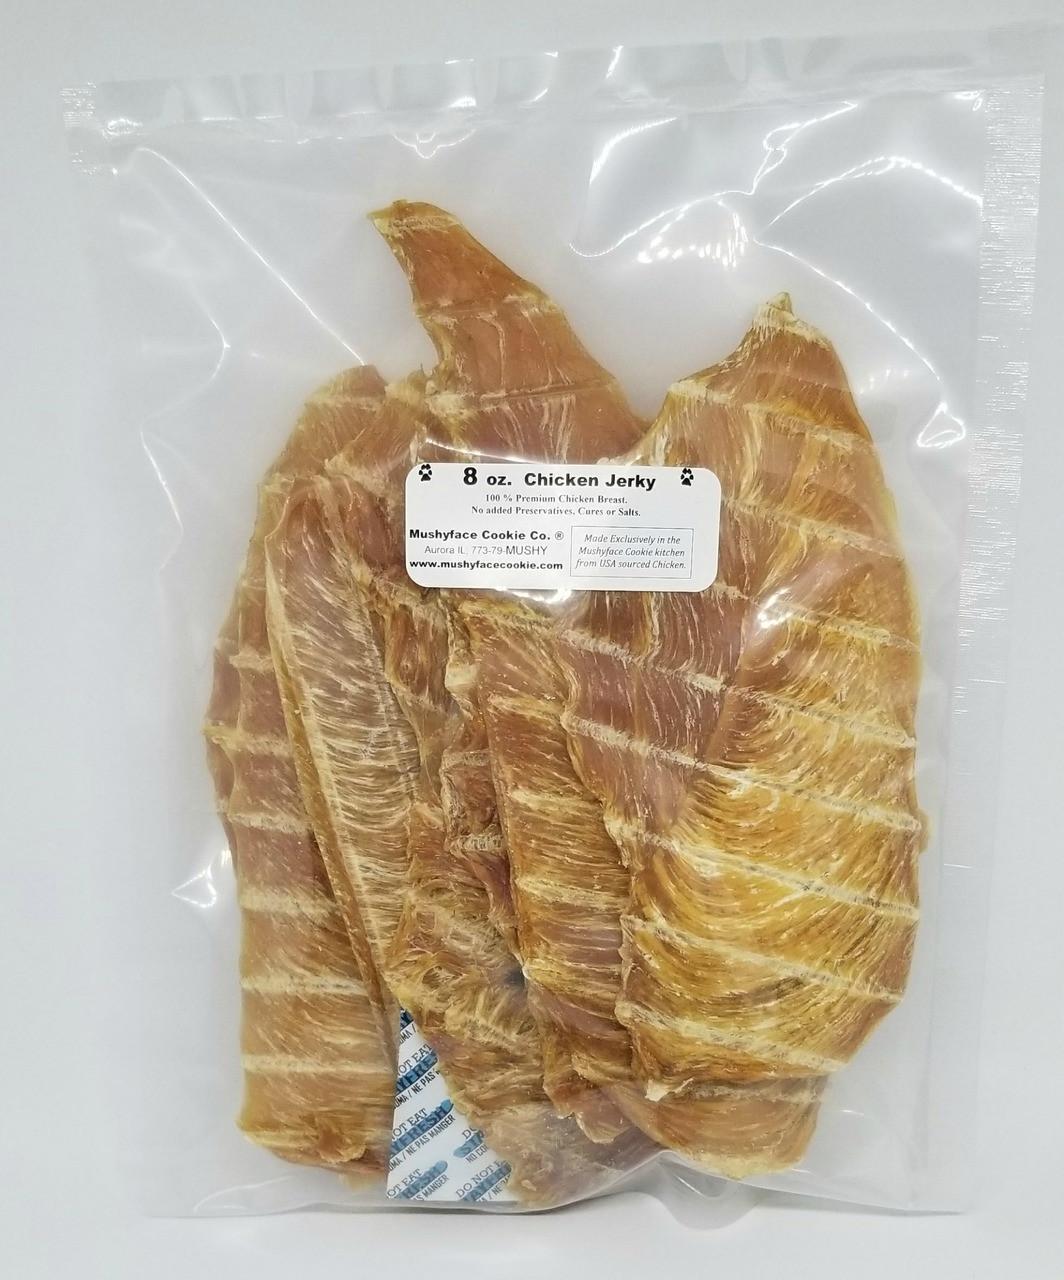 Reverse side of 8 oz. Chicken Jerky Bag